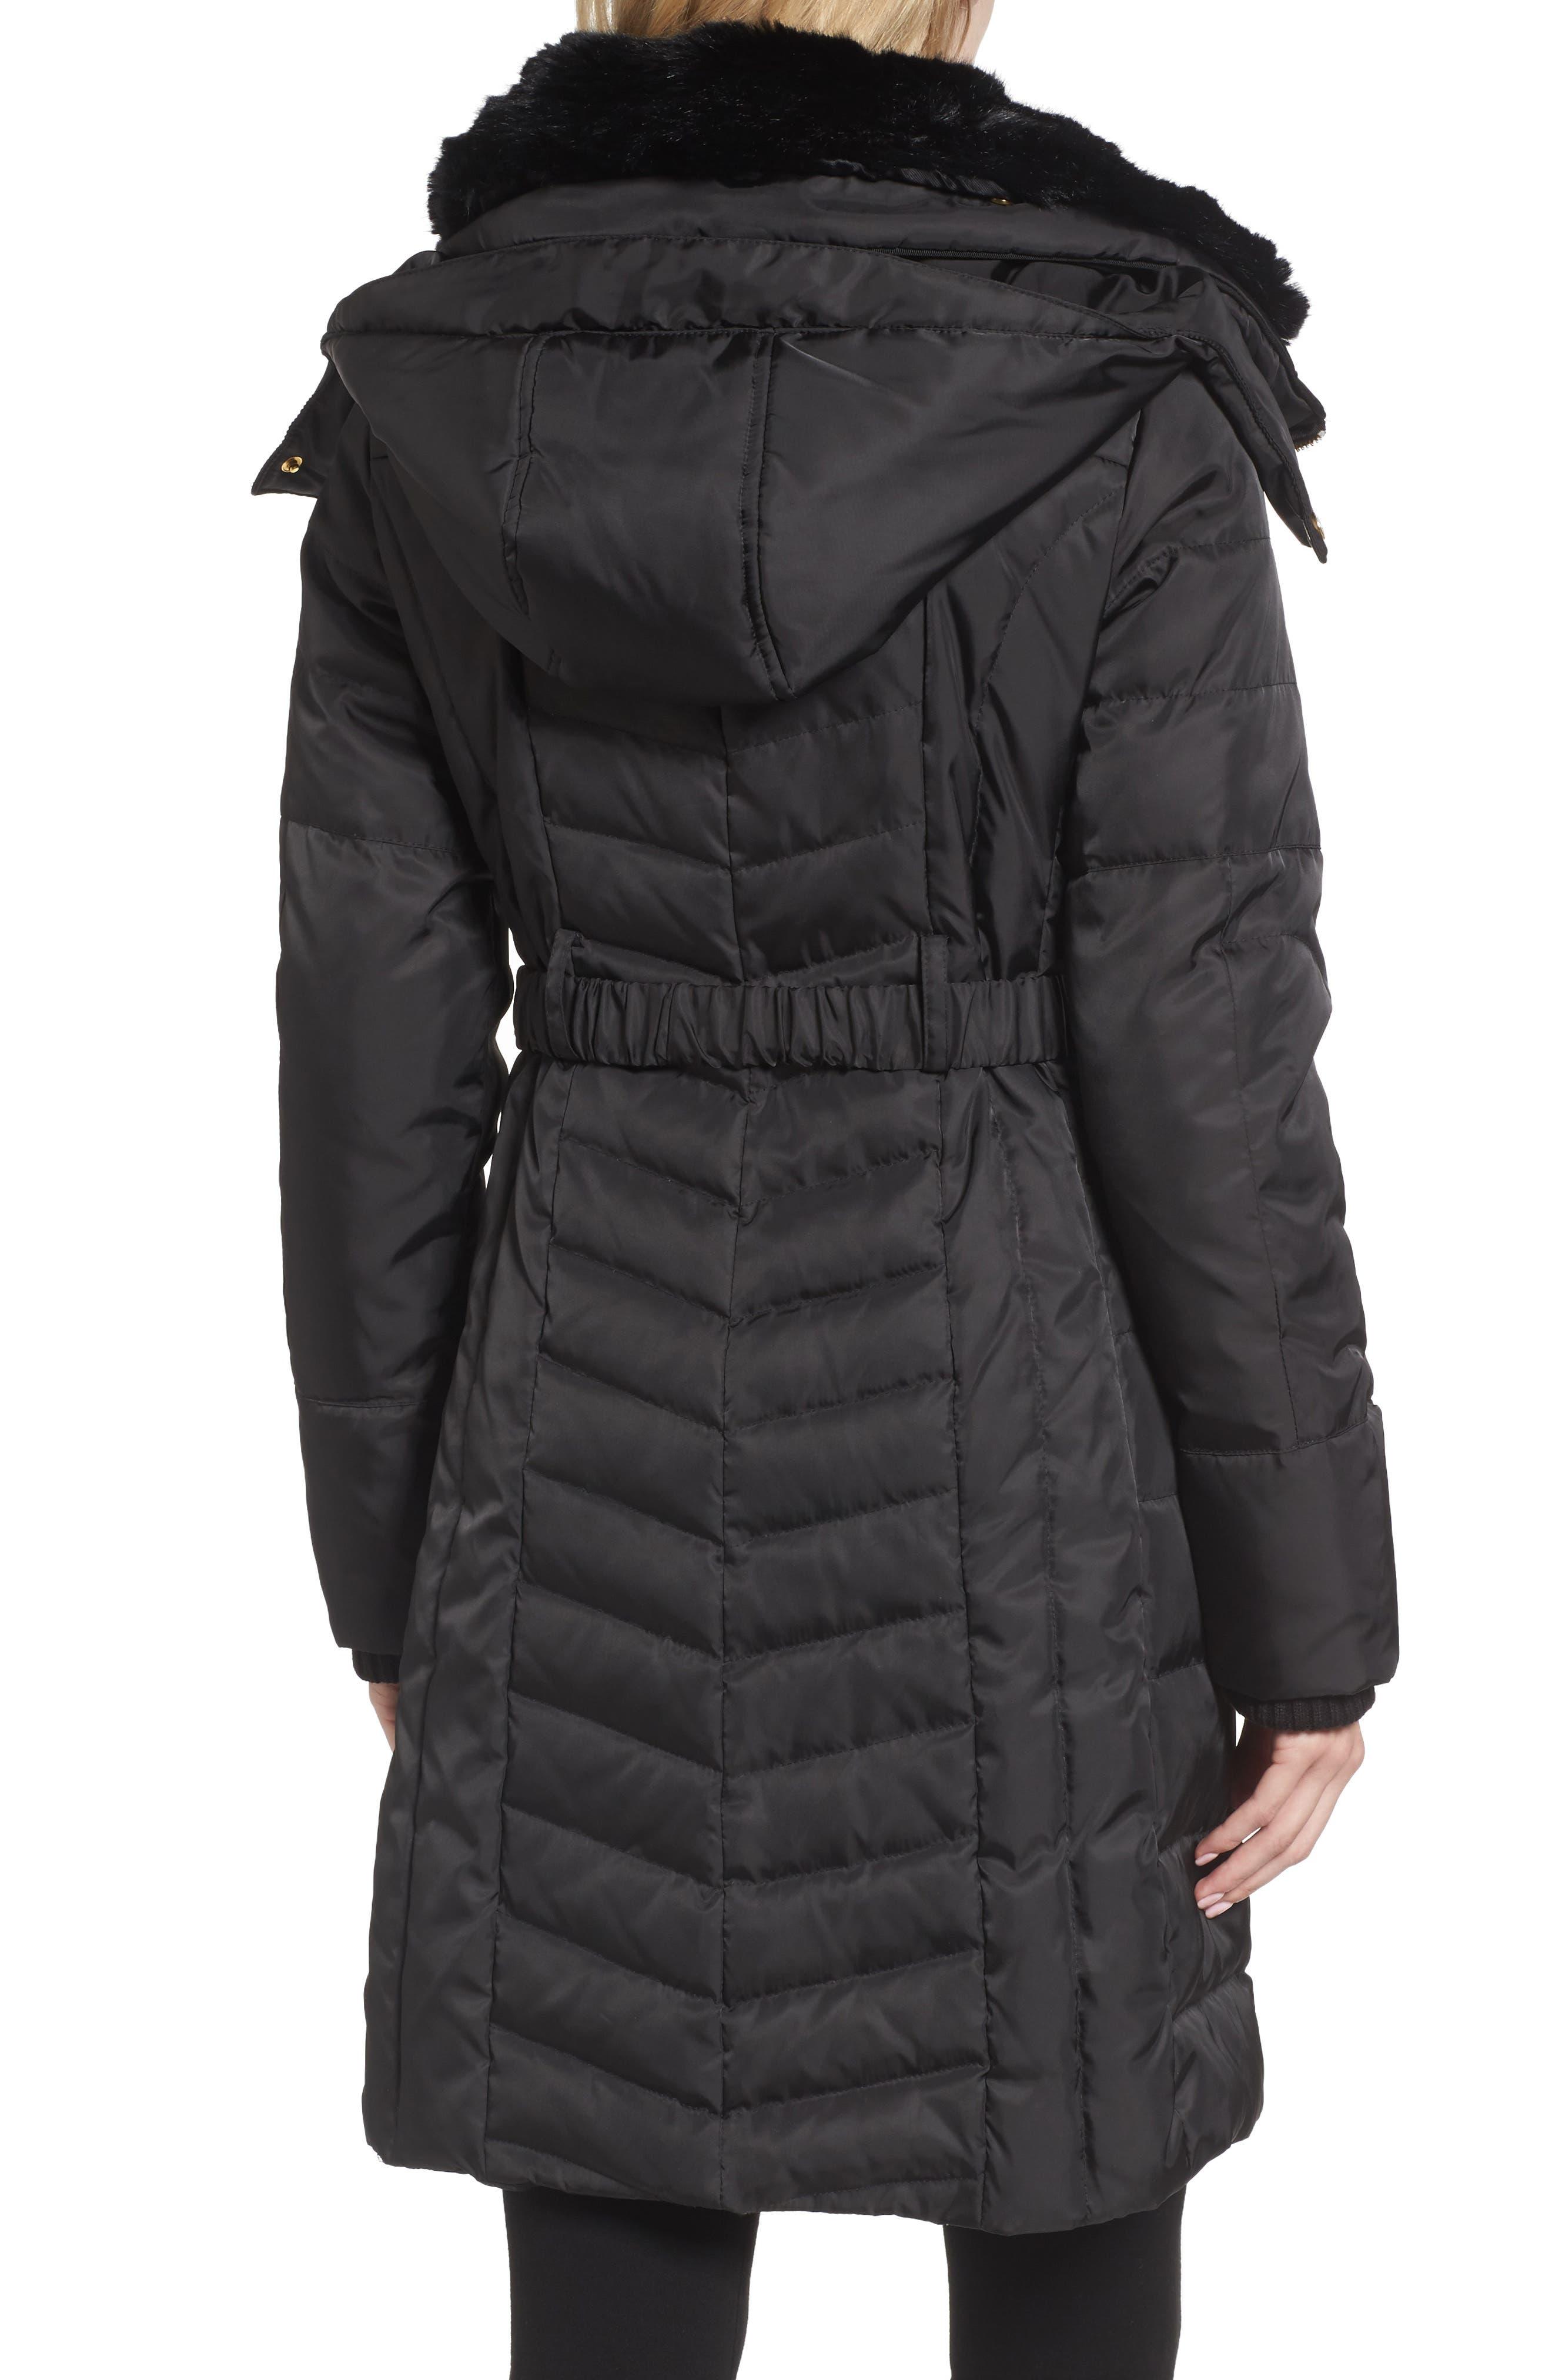 Belted Coat with Detachable Faux Fur,                             Alternate thumbnail 2, color,                             Black